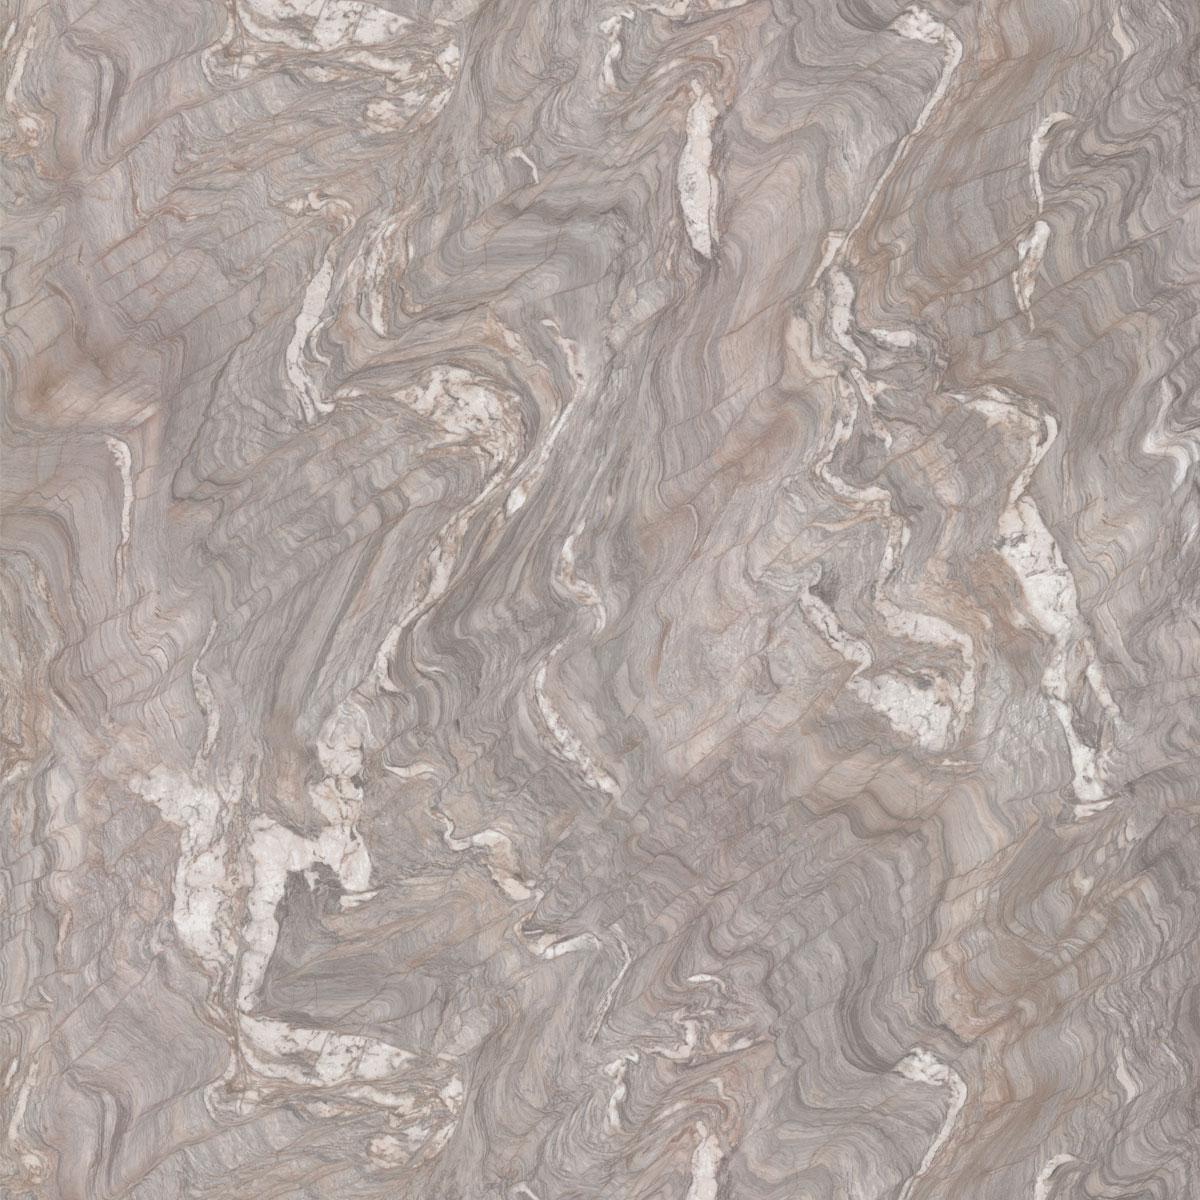 7404 Neopolitan Stone - Formica